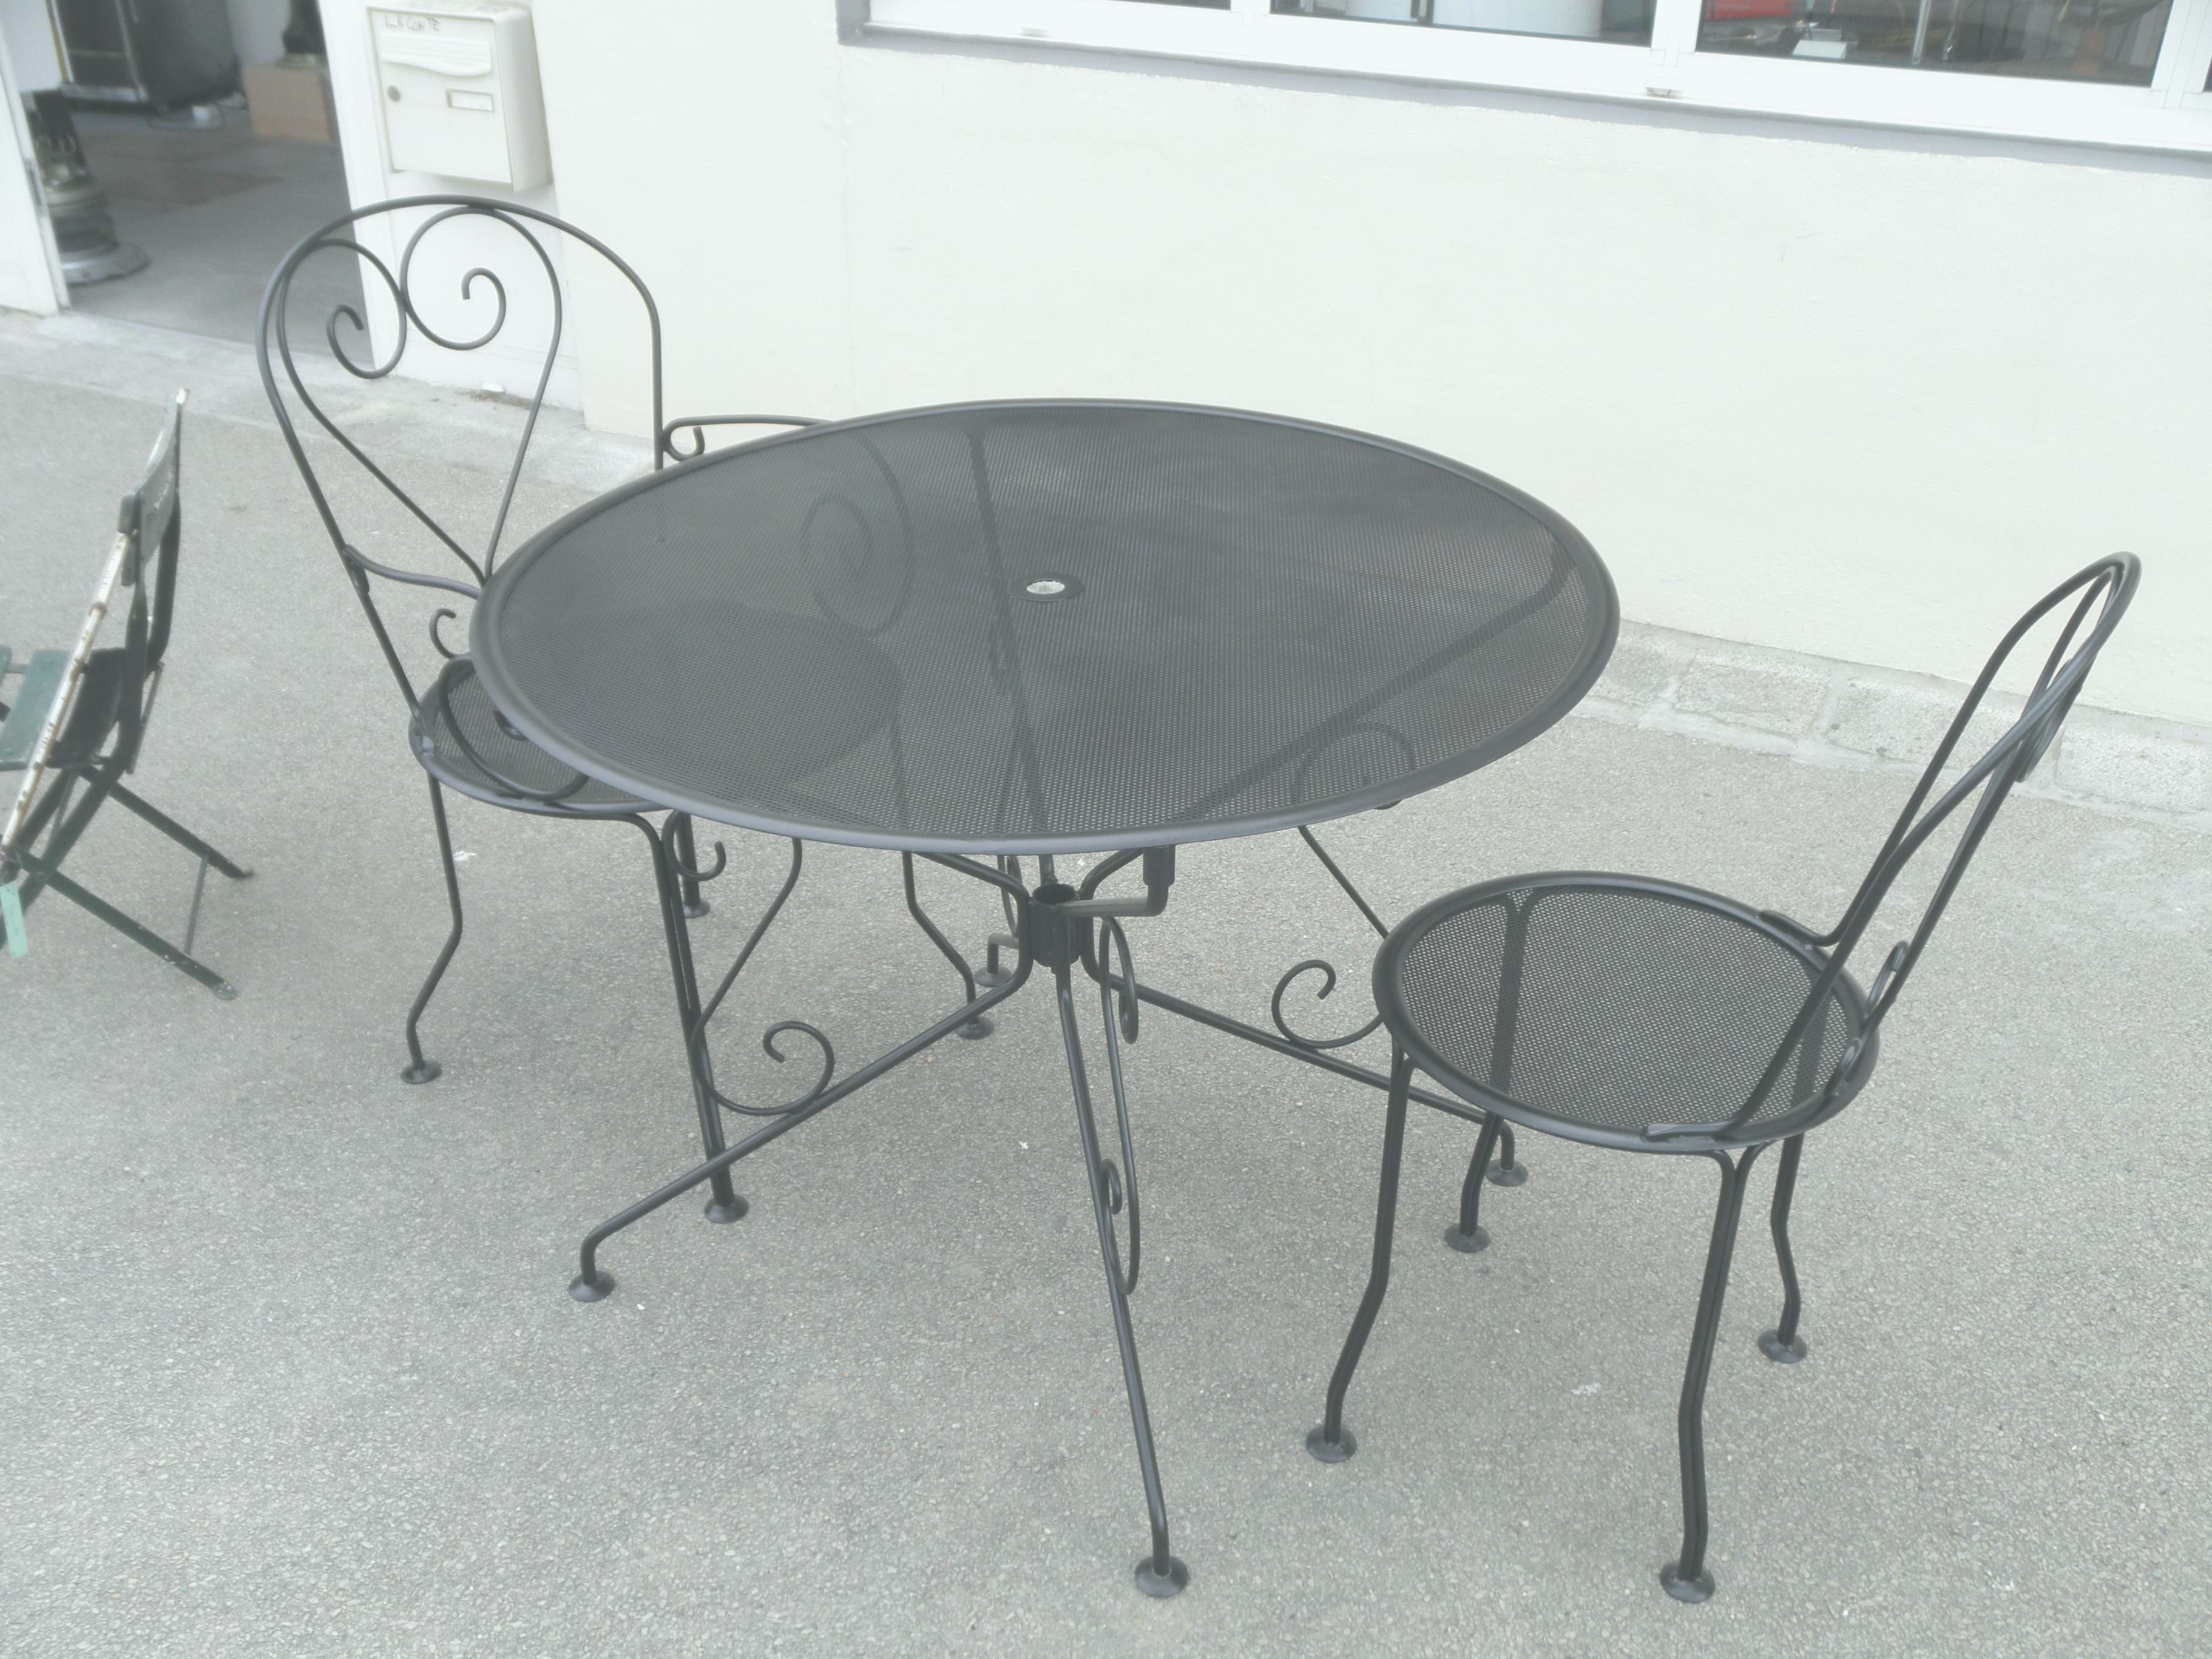 Table Kettler solde Inspirant Stock Table Pliable Pas Cher Luxe 20 Inspirant Table Jardin Pliante